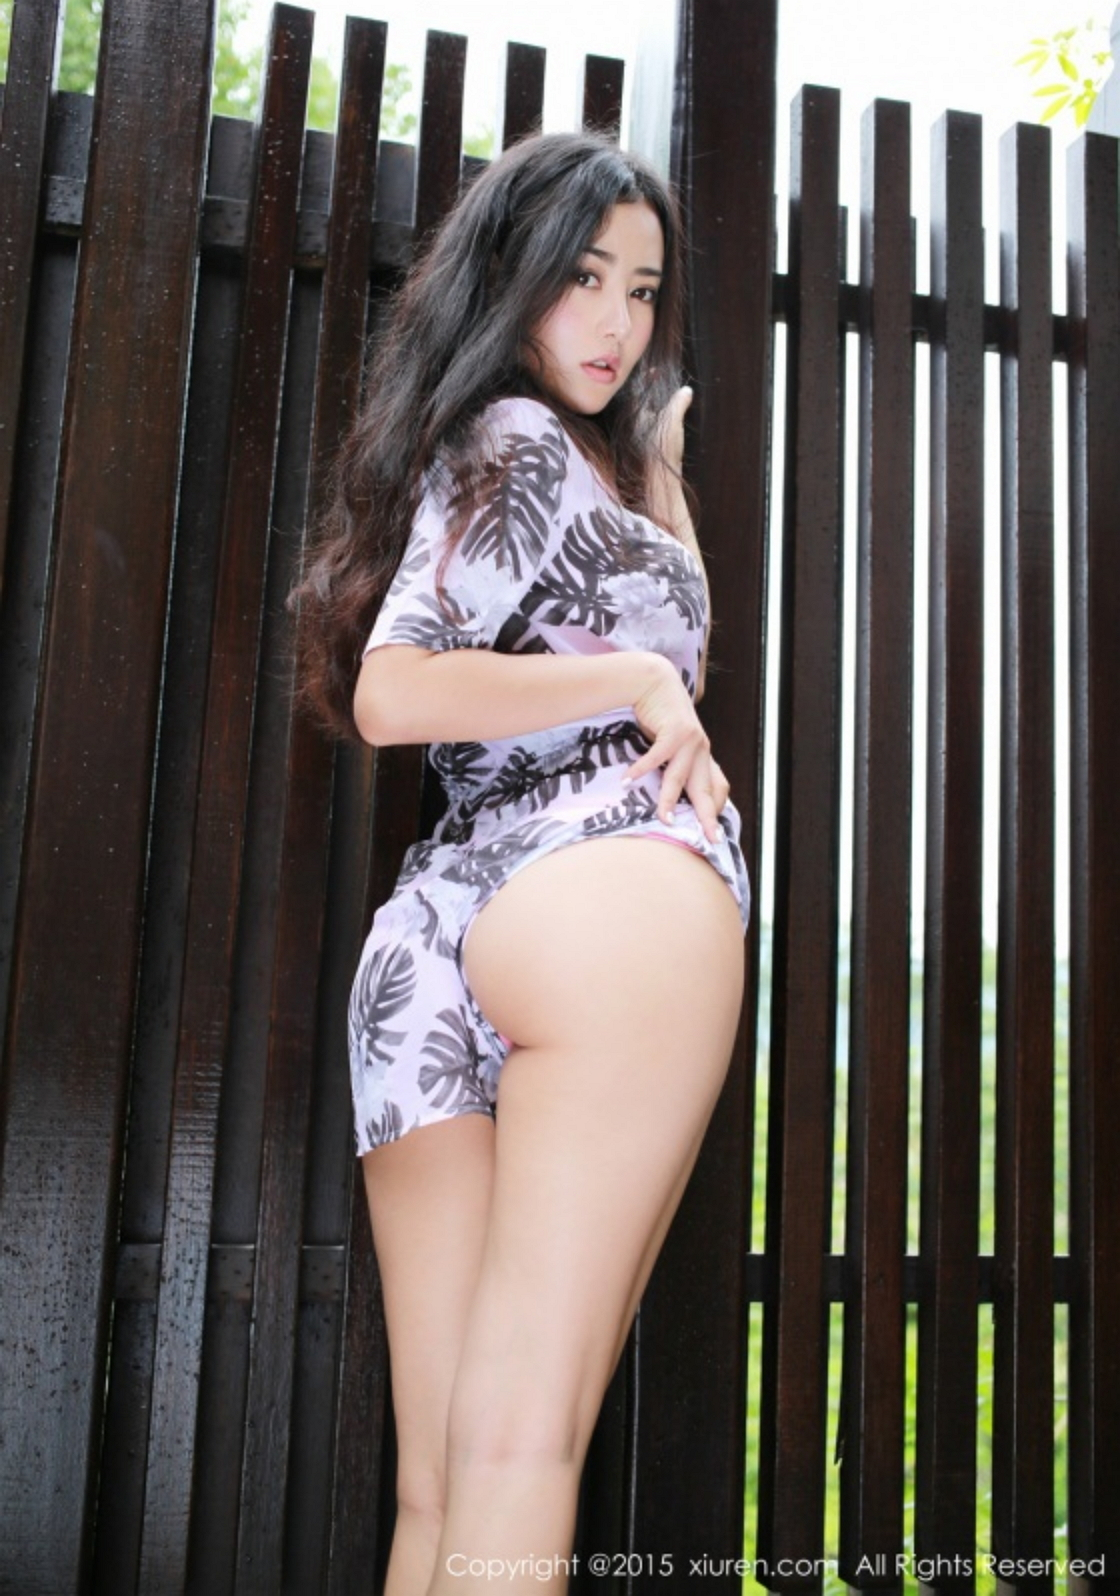 329 046 - Hot Photo XIUREN NO.329 Nude Girl